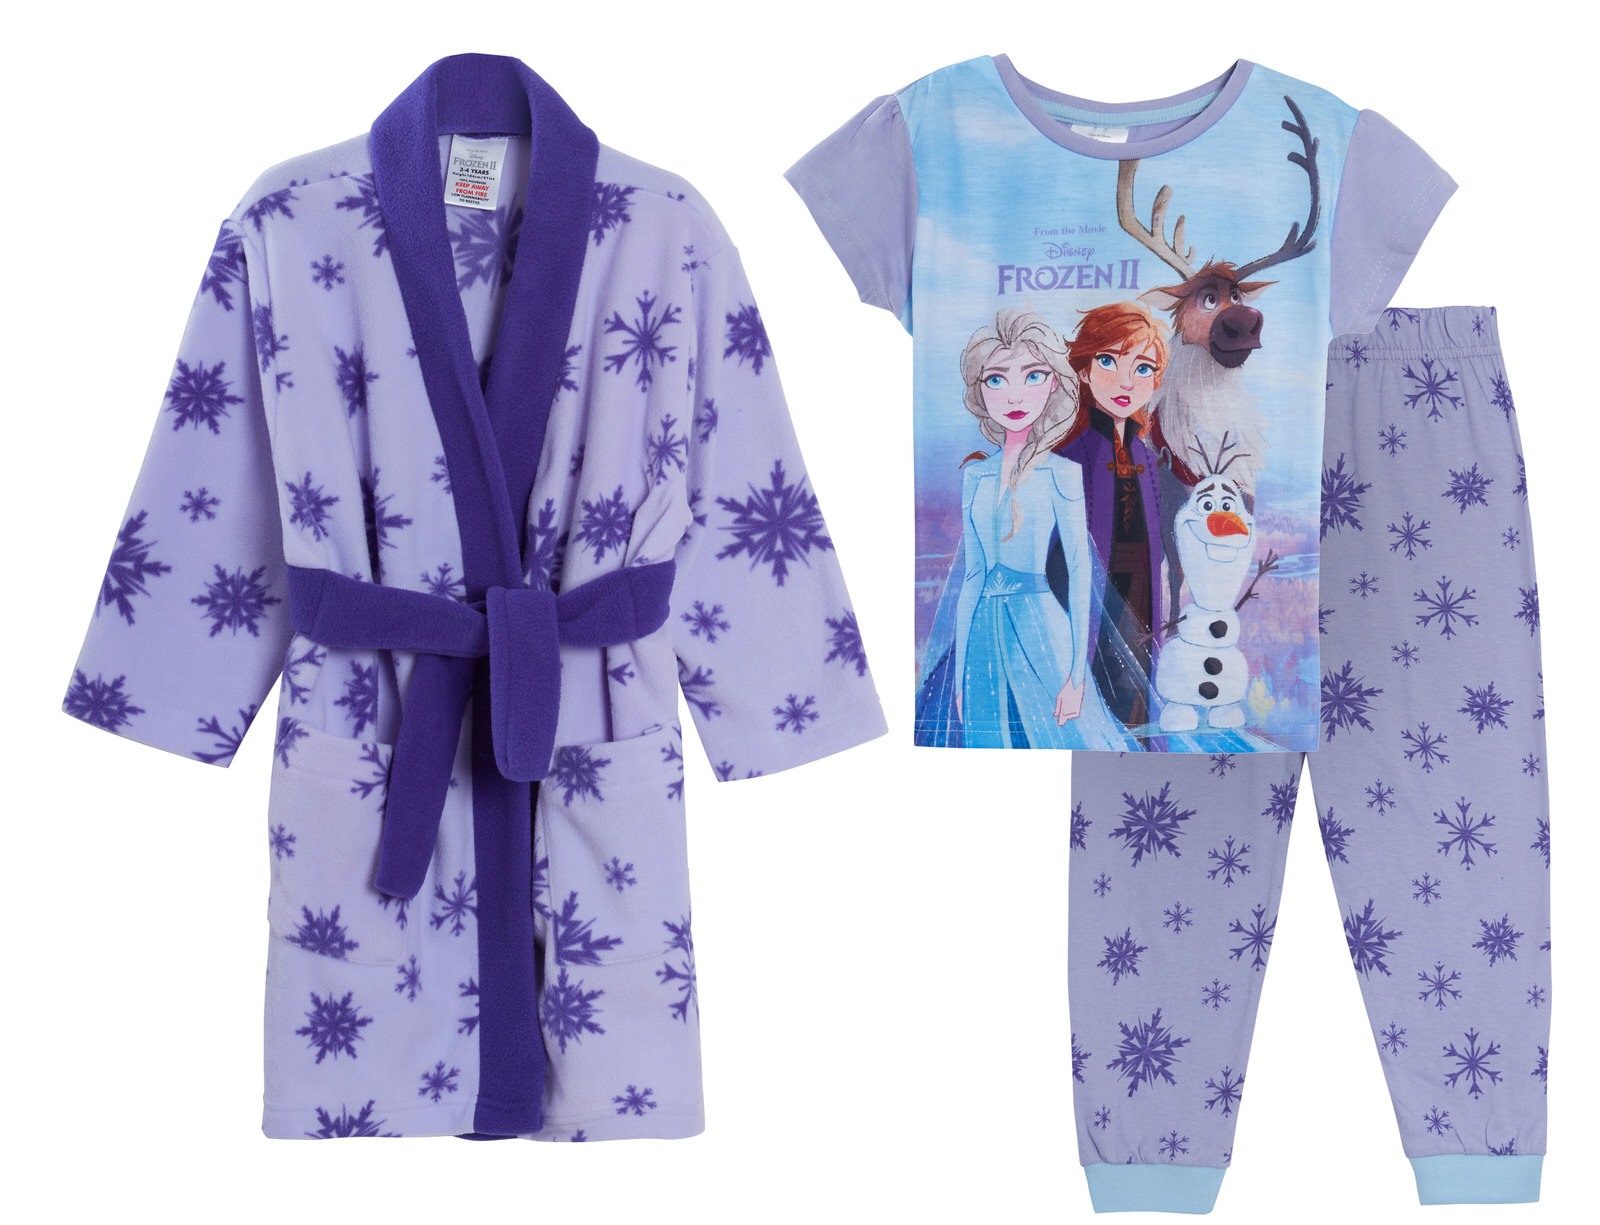 Girls Disney Frozen 2 Pyjamas Bath Robe Matching Set Kids Nightwear Pjs Gown Ebay